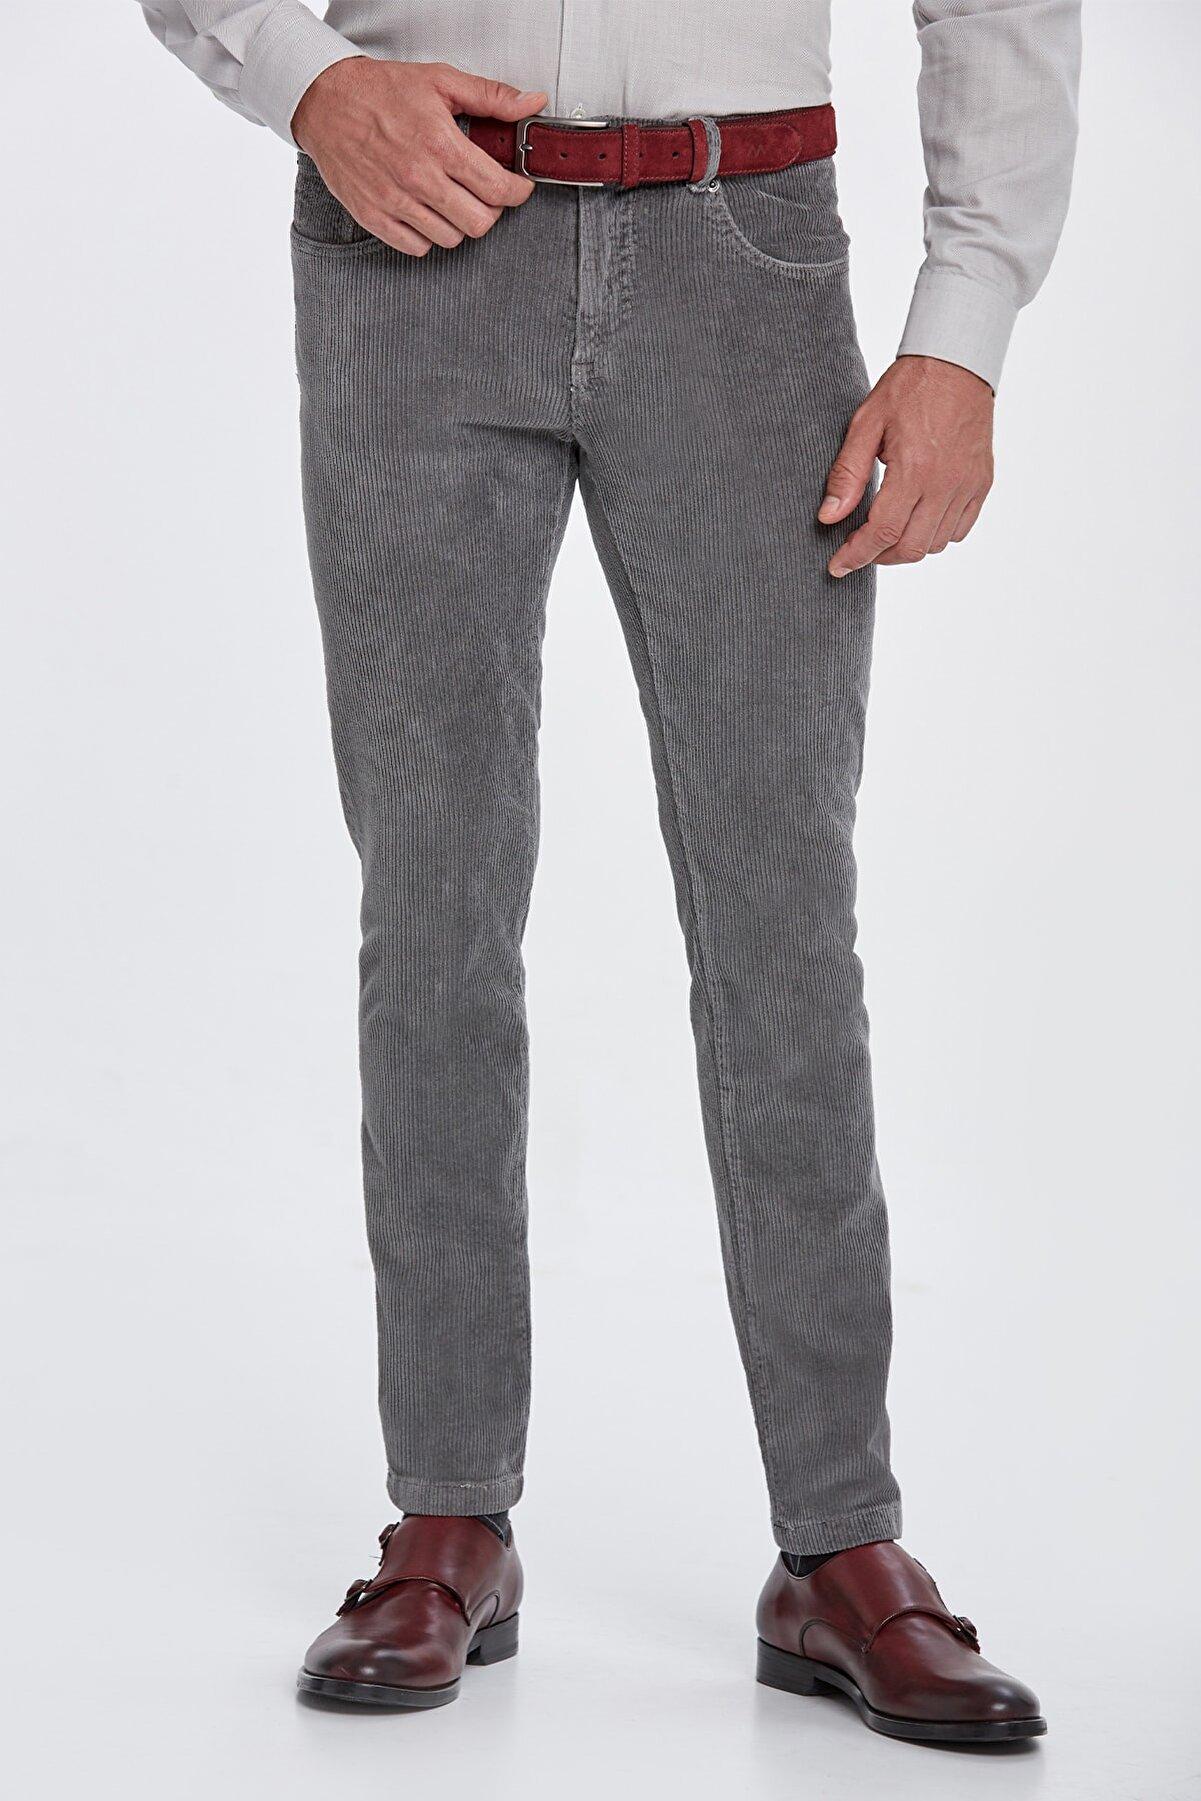 Hemington Slim Fit Gri Kadife Pantolon